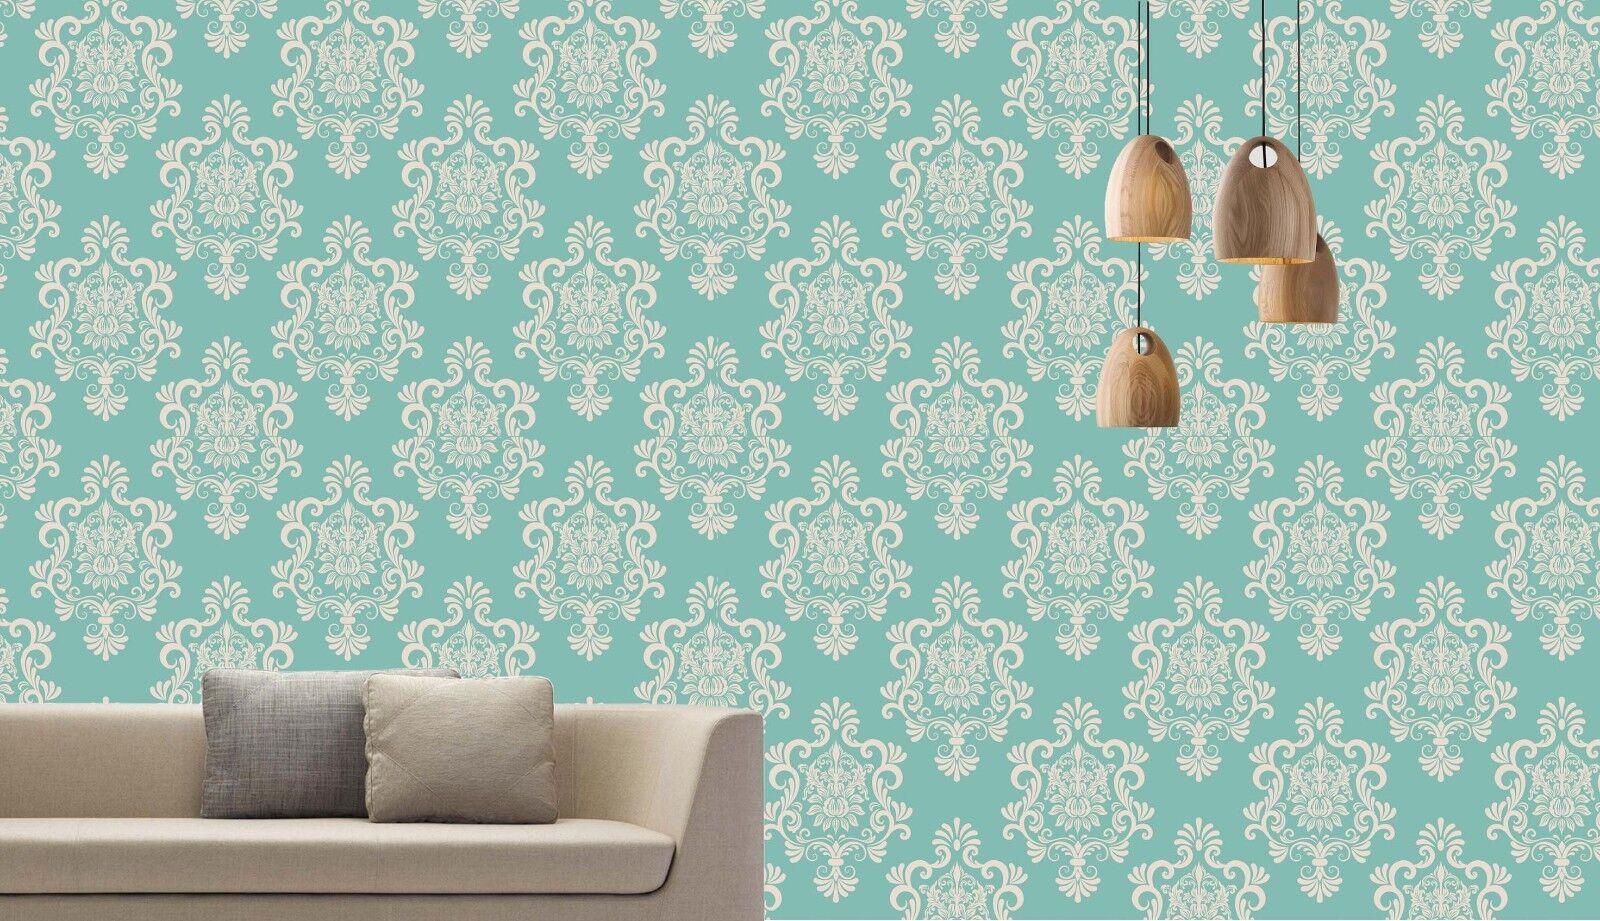 3D Grün Patterns 731 Wall Paper Print Wall Decal Deco Indoor Wall Murals US